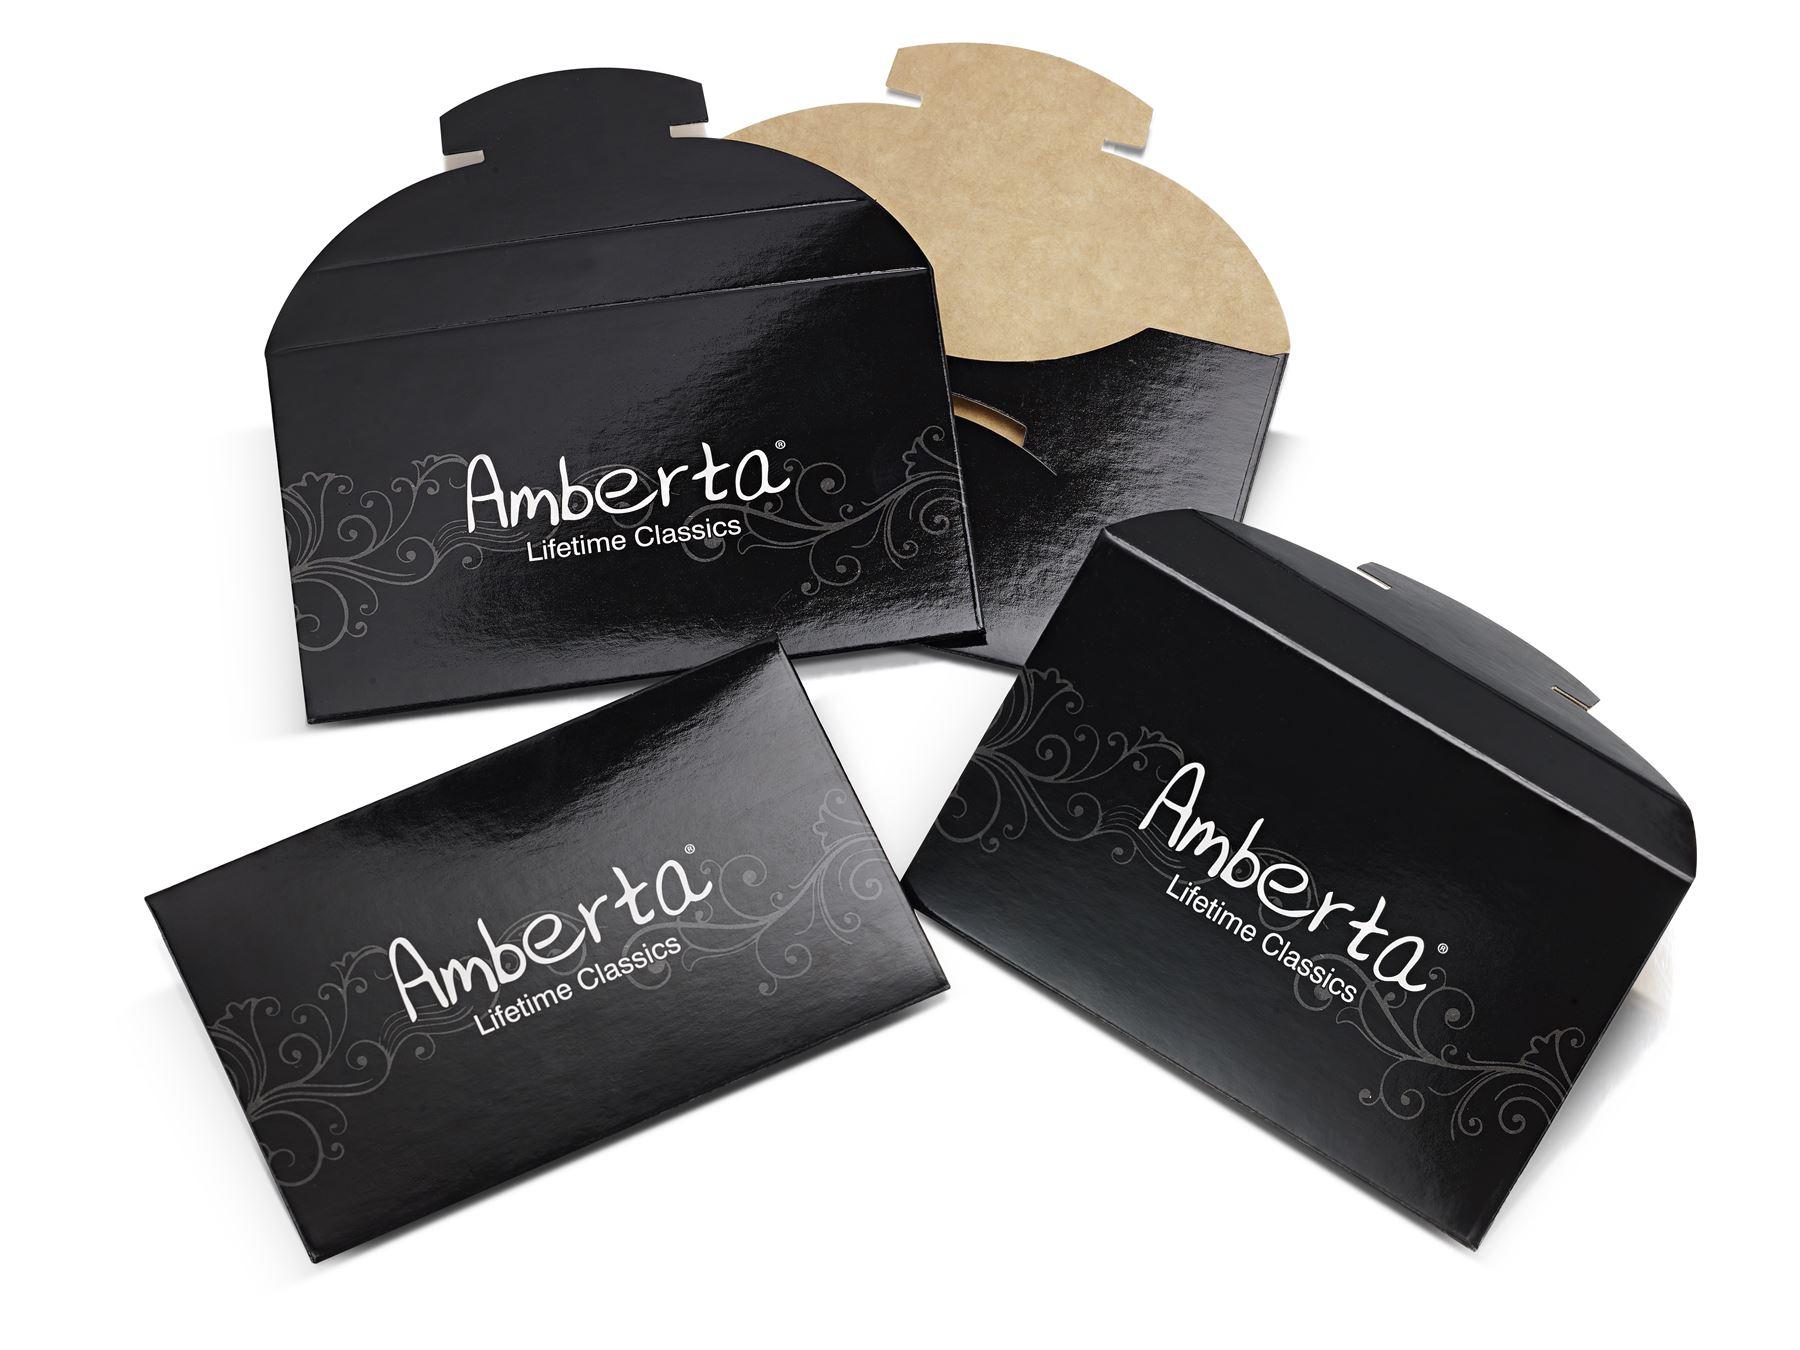 Amberta-Jewelry-925-Sterling-Silver-Adjustable-Bracelet-Italian-Bangle-for-Women miniature 19